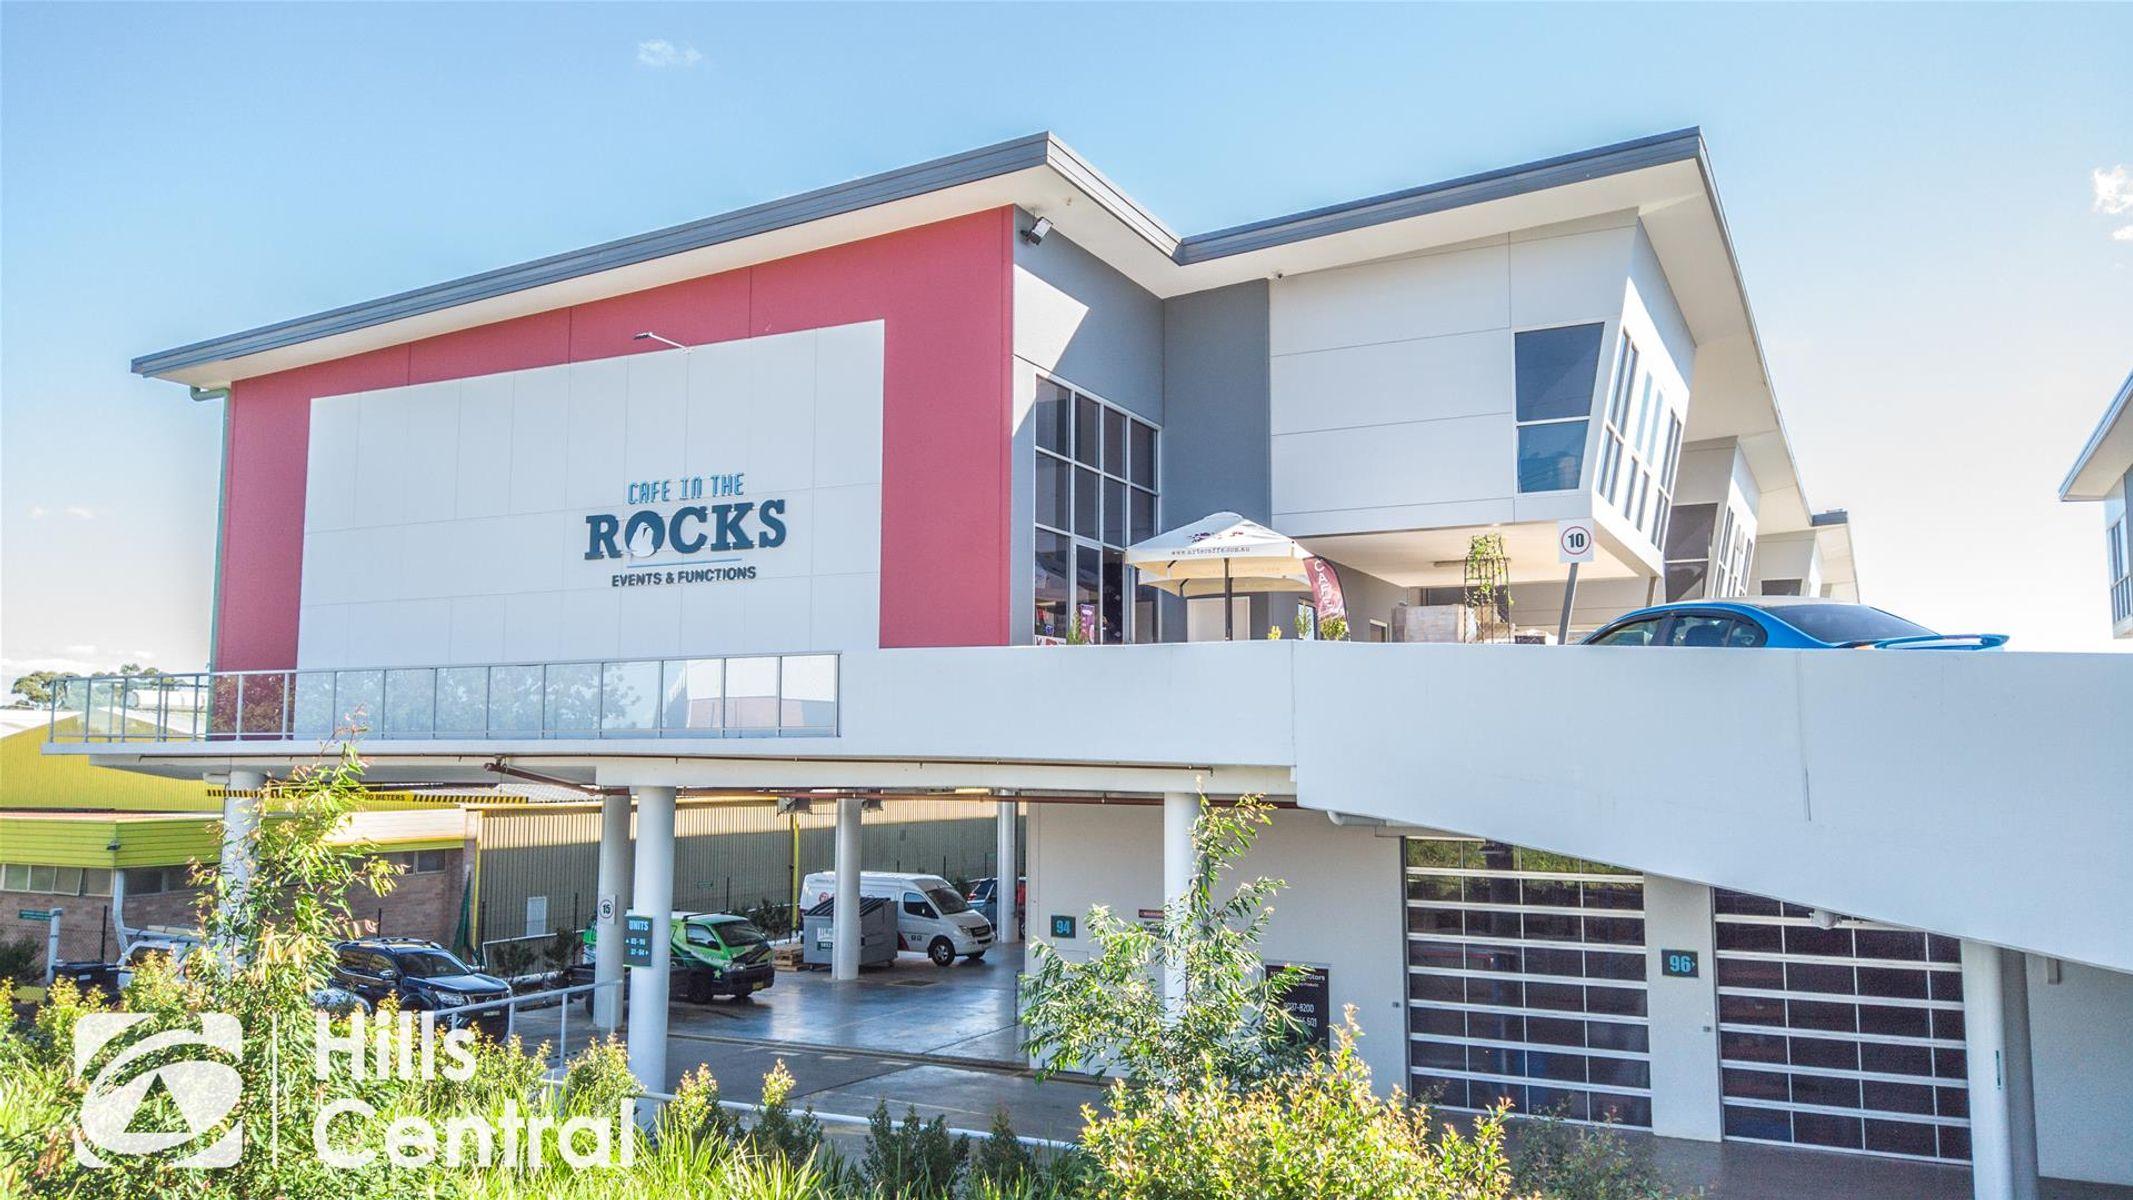 96/14 Loyalty Road, North Rocks, NSW 2151